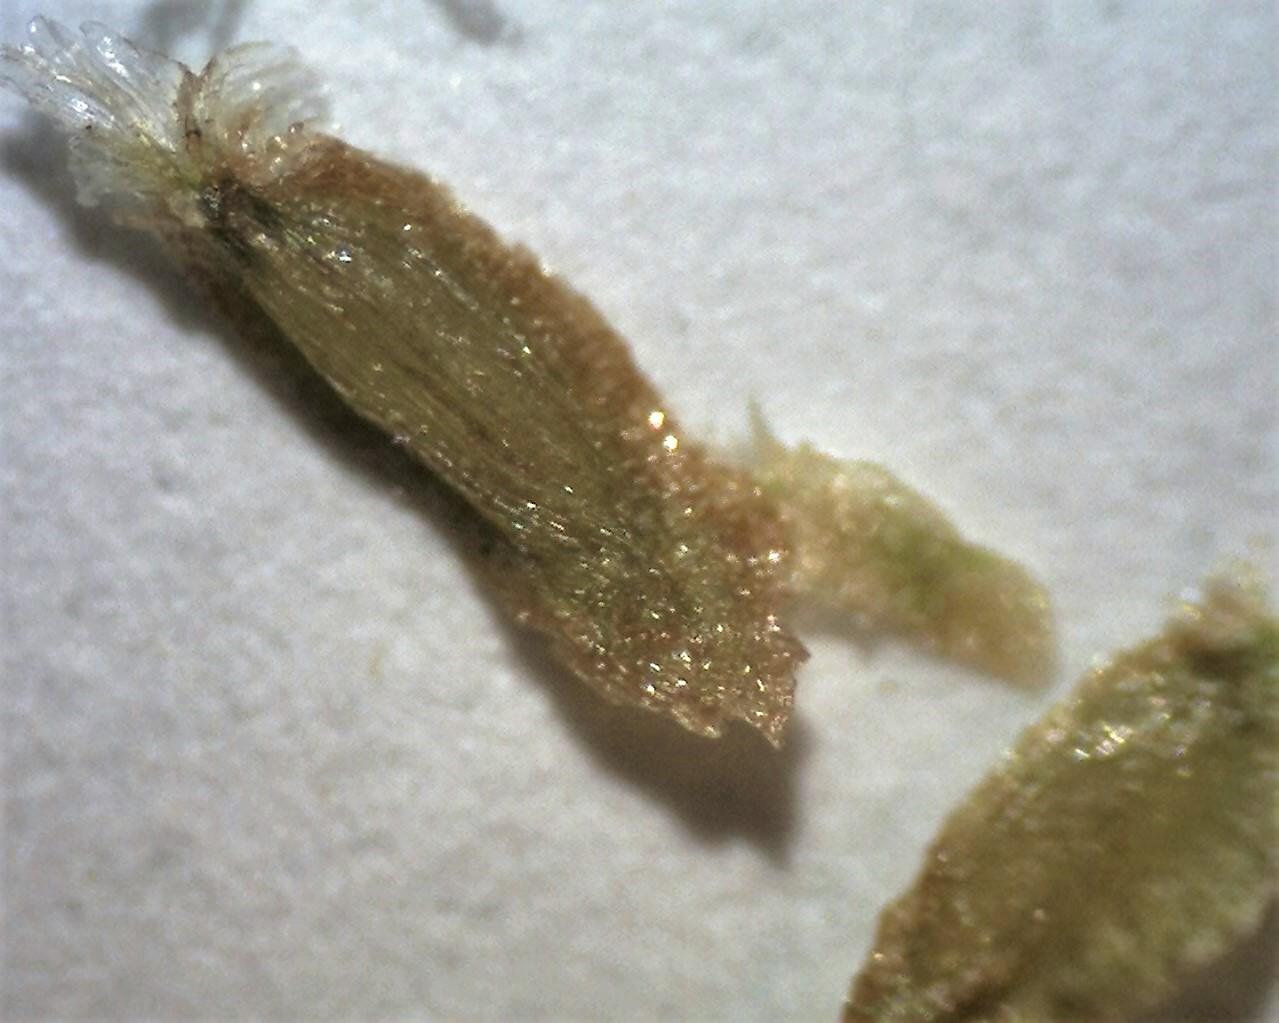 rh-rex-longzhou-shan-seeds